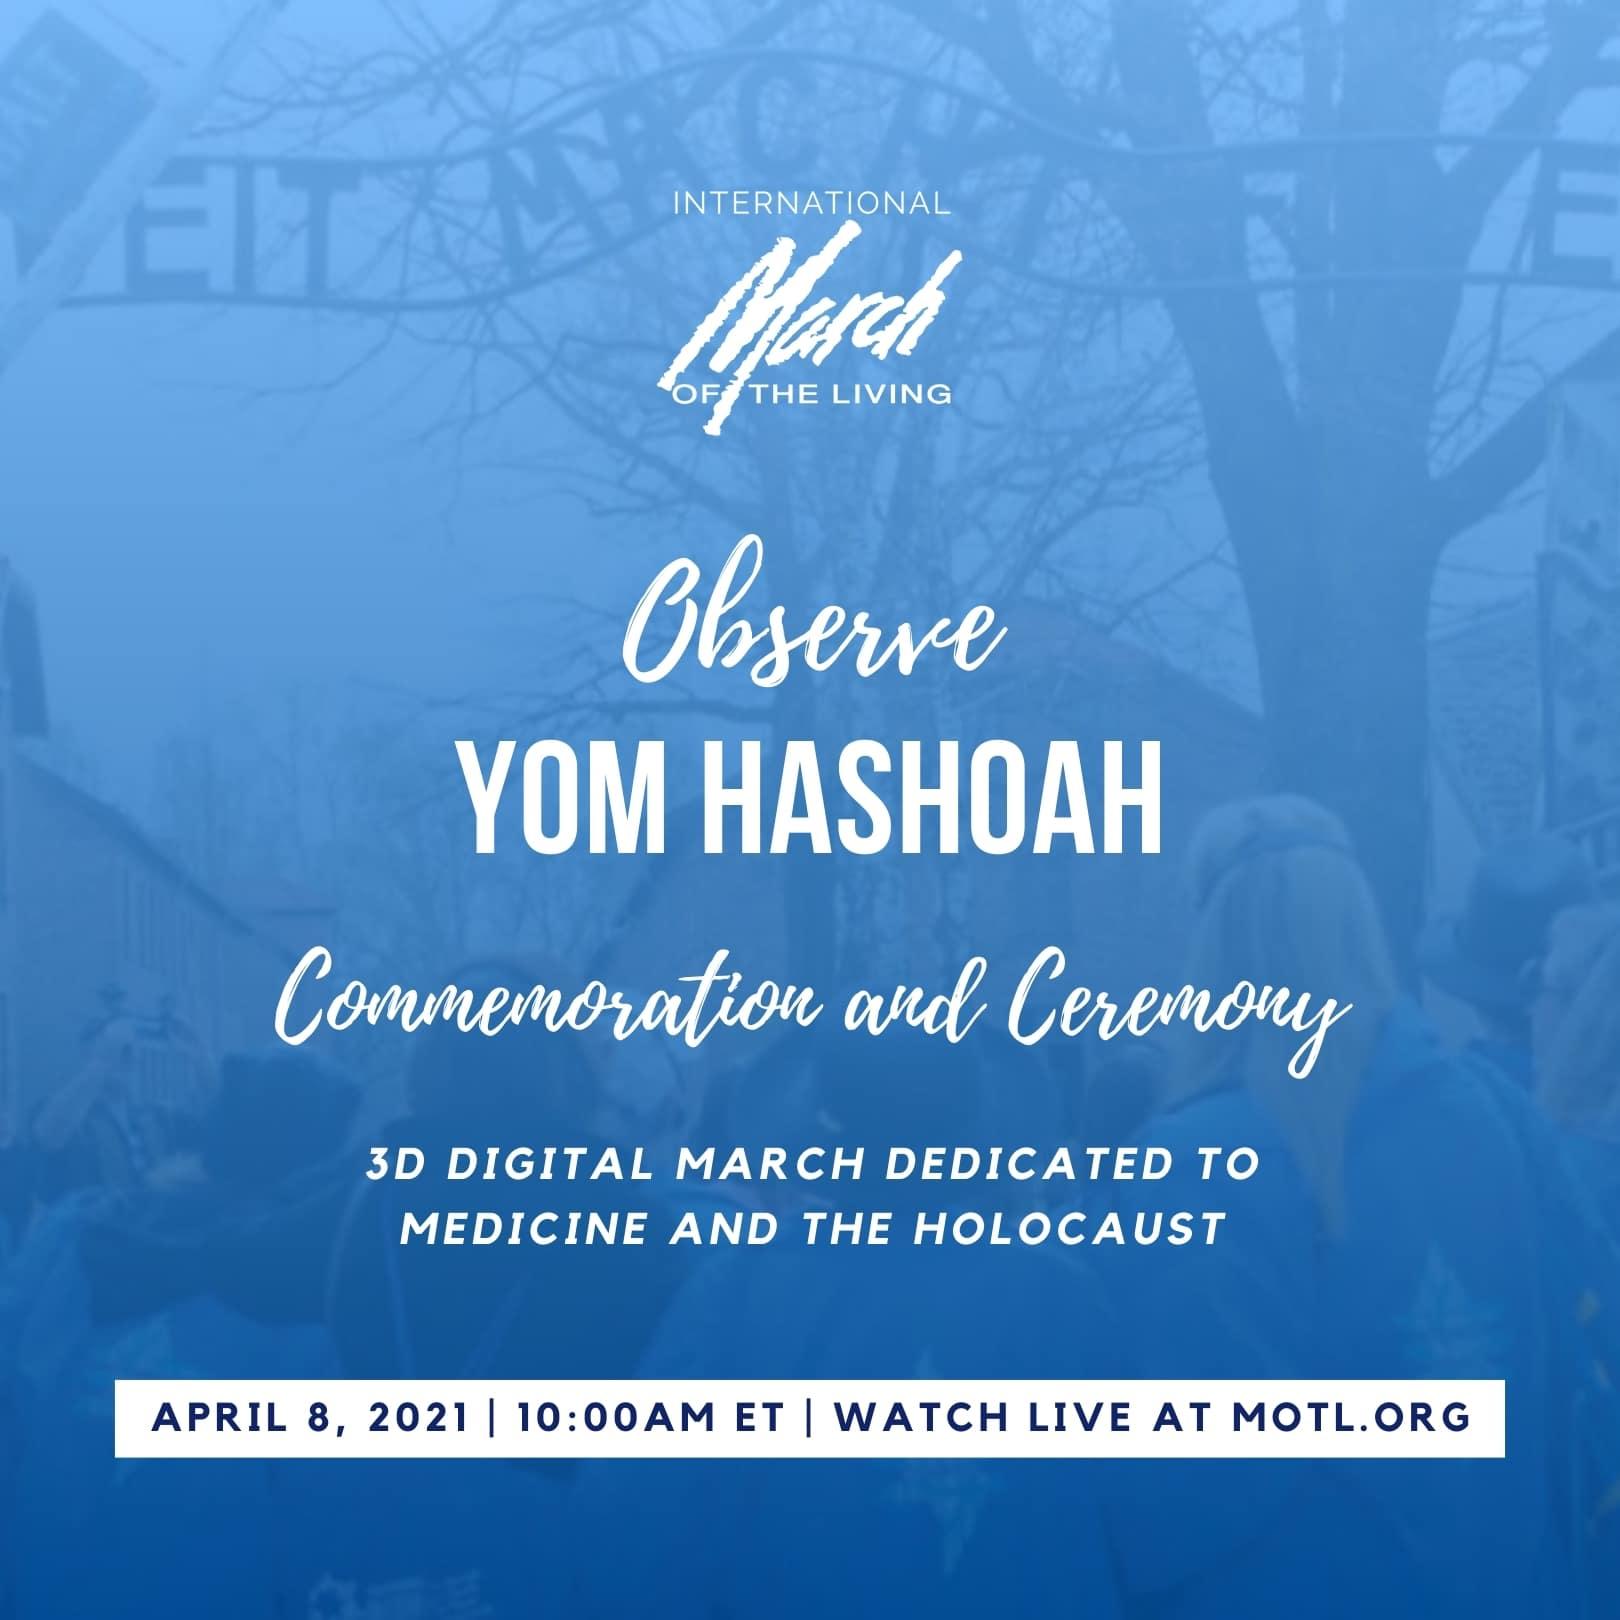 MOTL 2021 Yom HaShoah Square